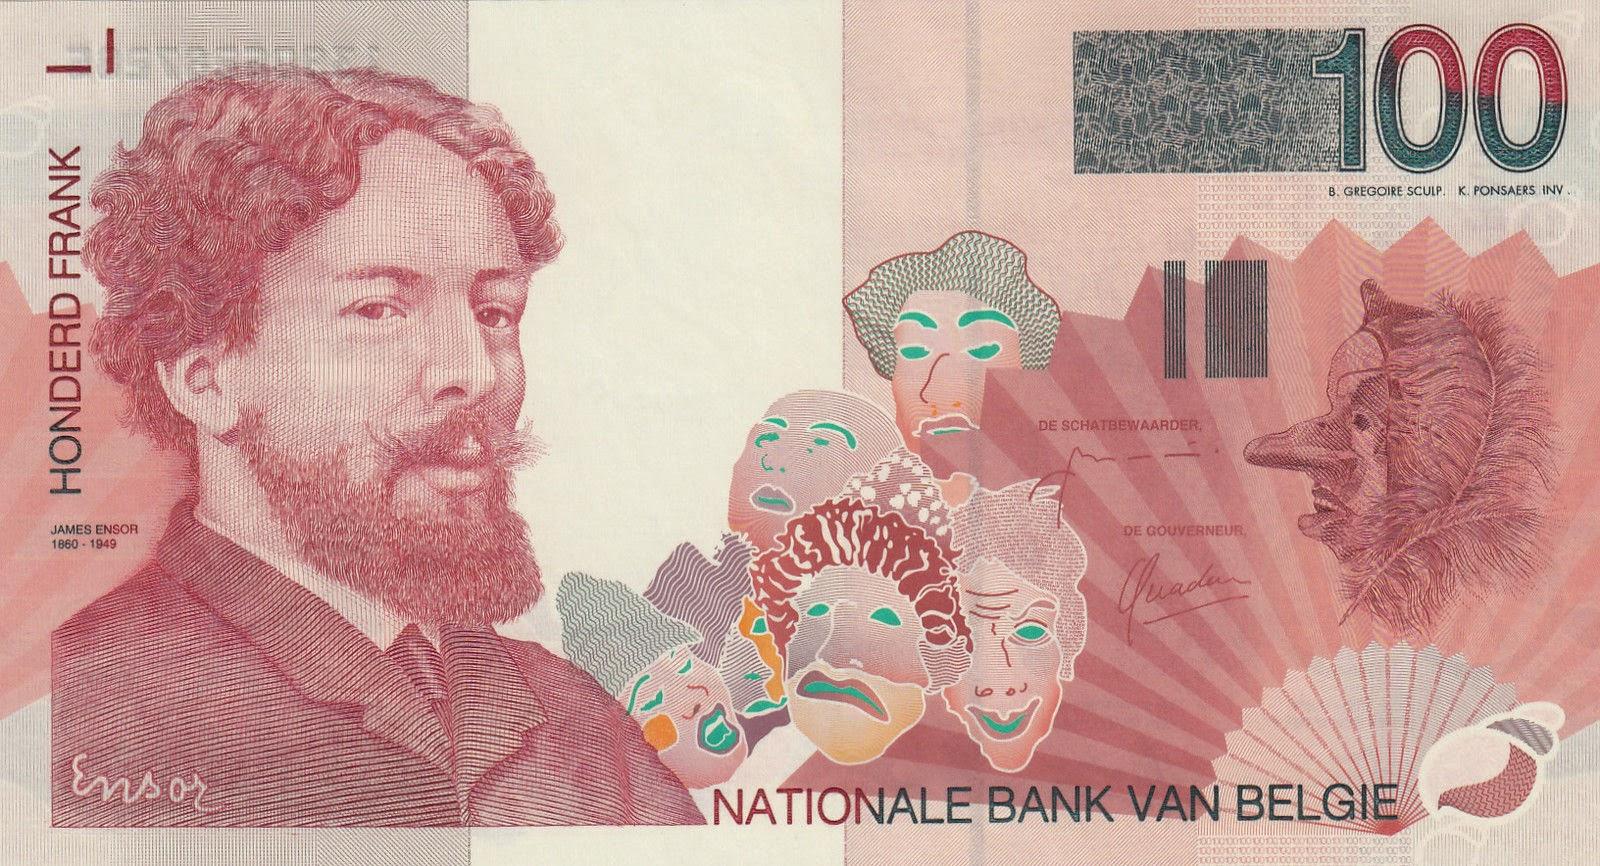 Belgium Banknotes 100 Belgian Francs banknote 1995 James Ensor